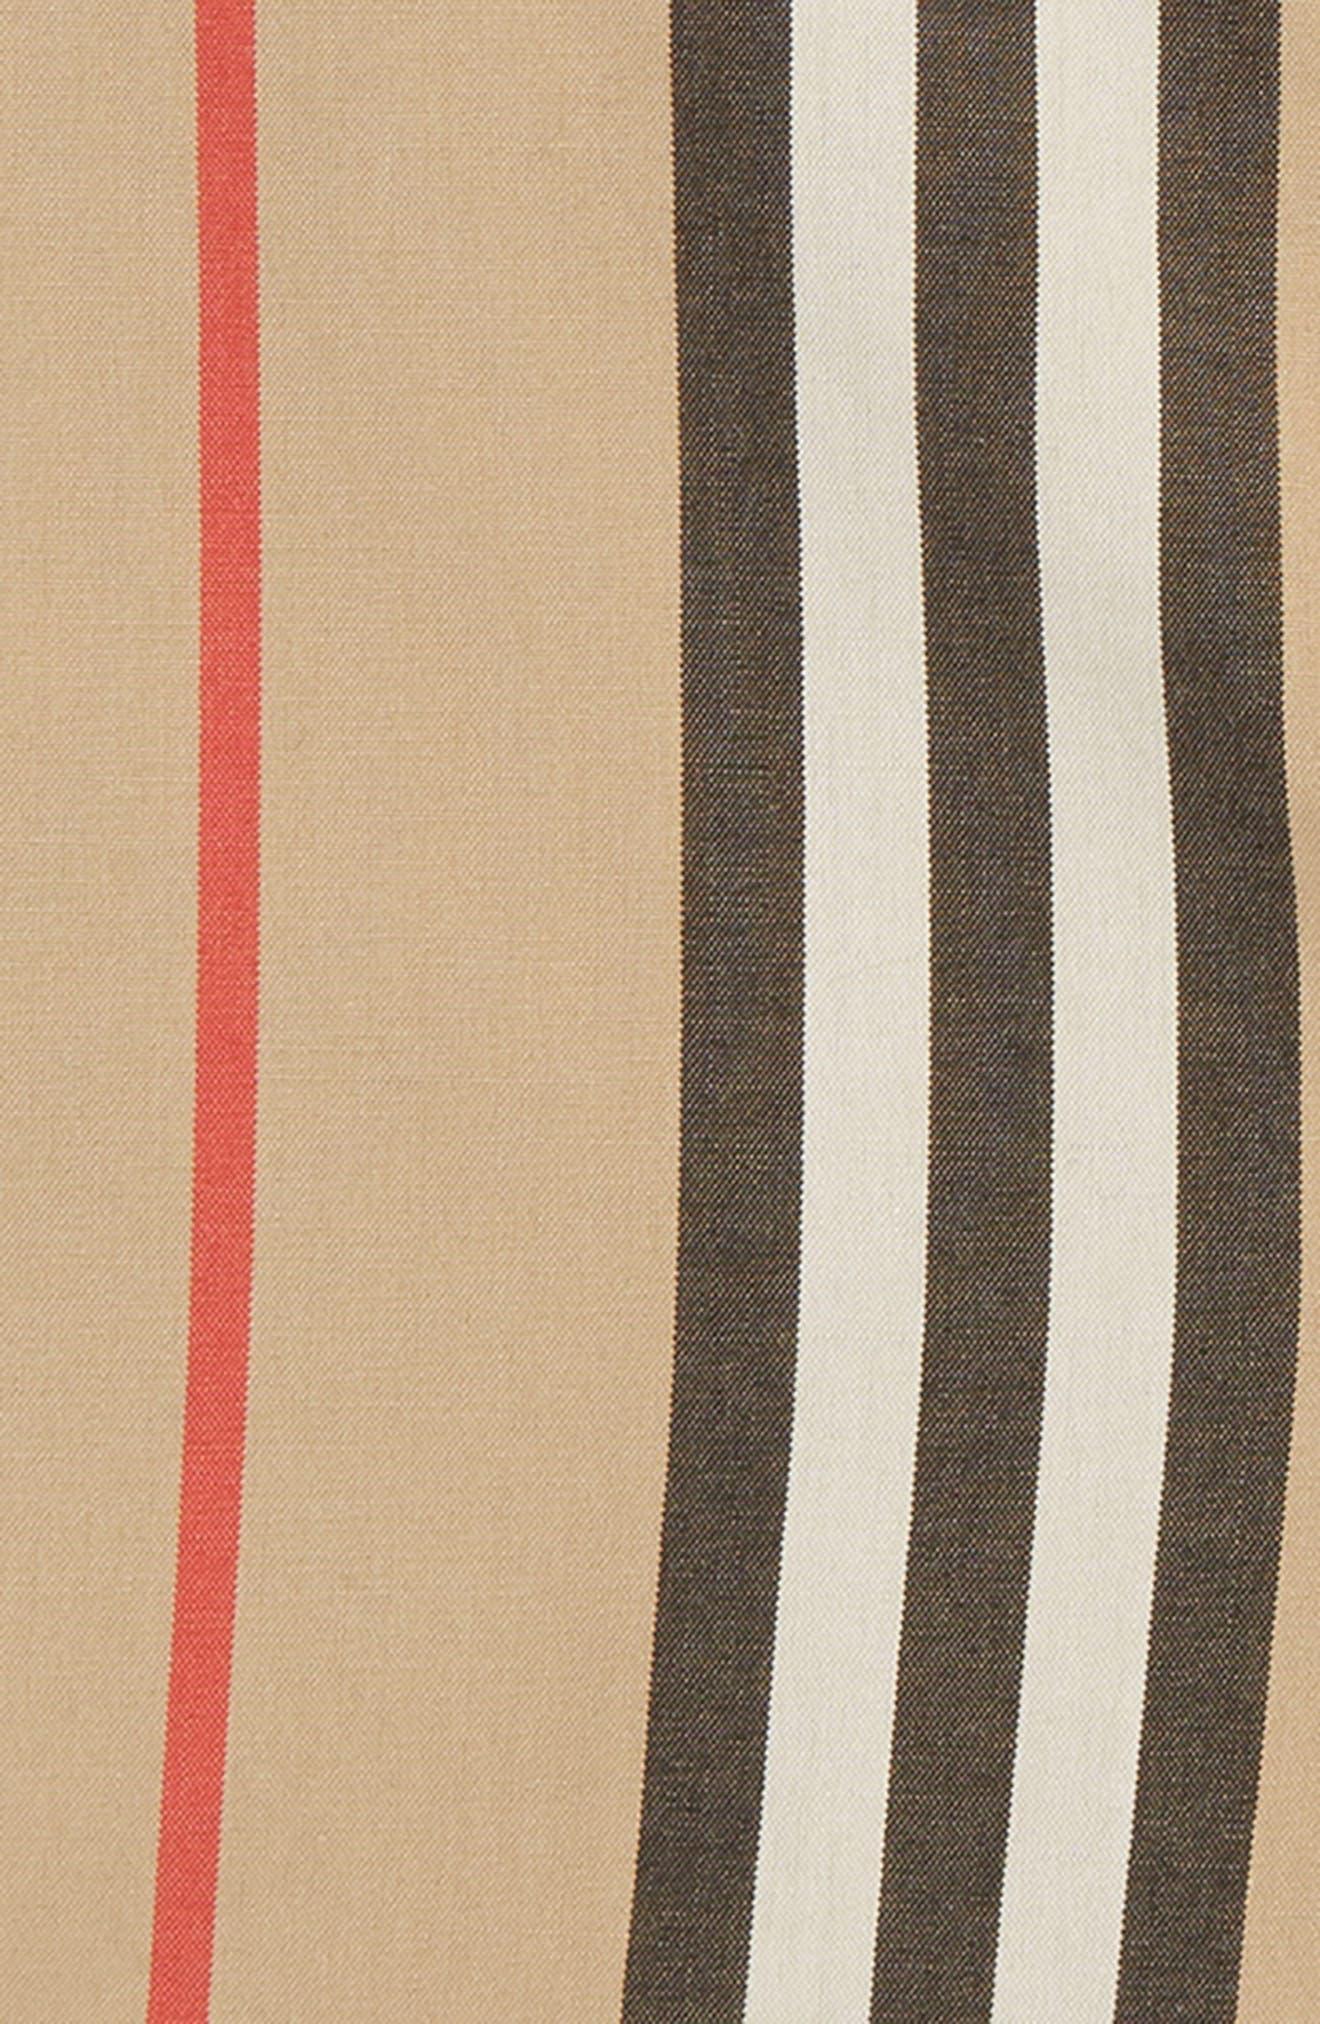 BURBERRY,                             Nicki Stripe Shorts,                             Alternate thumbnail 2, color,                             ARCHIVE BEIGE